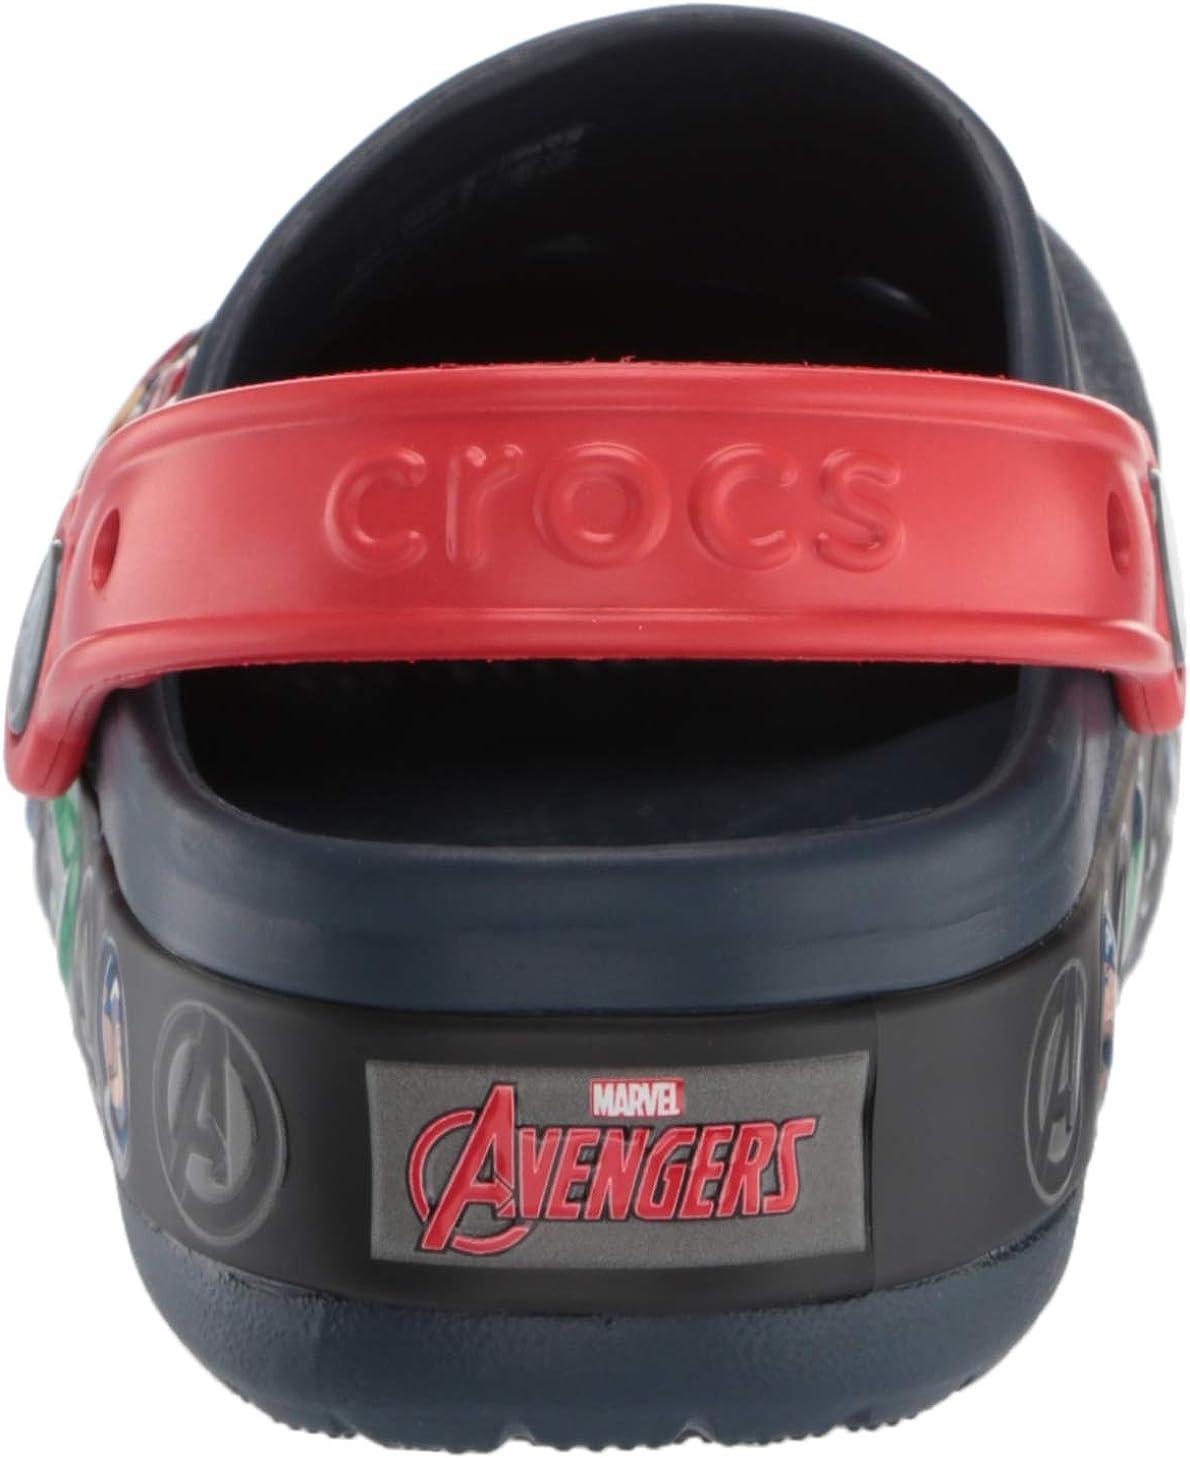 Crocs Kids Boys and Girls Marvel Light Up Clog